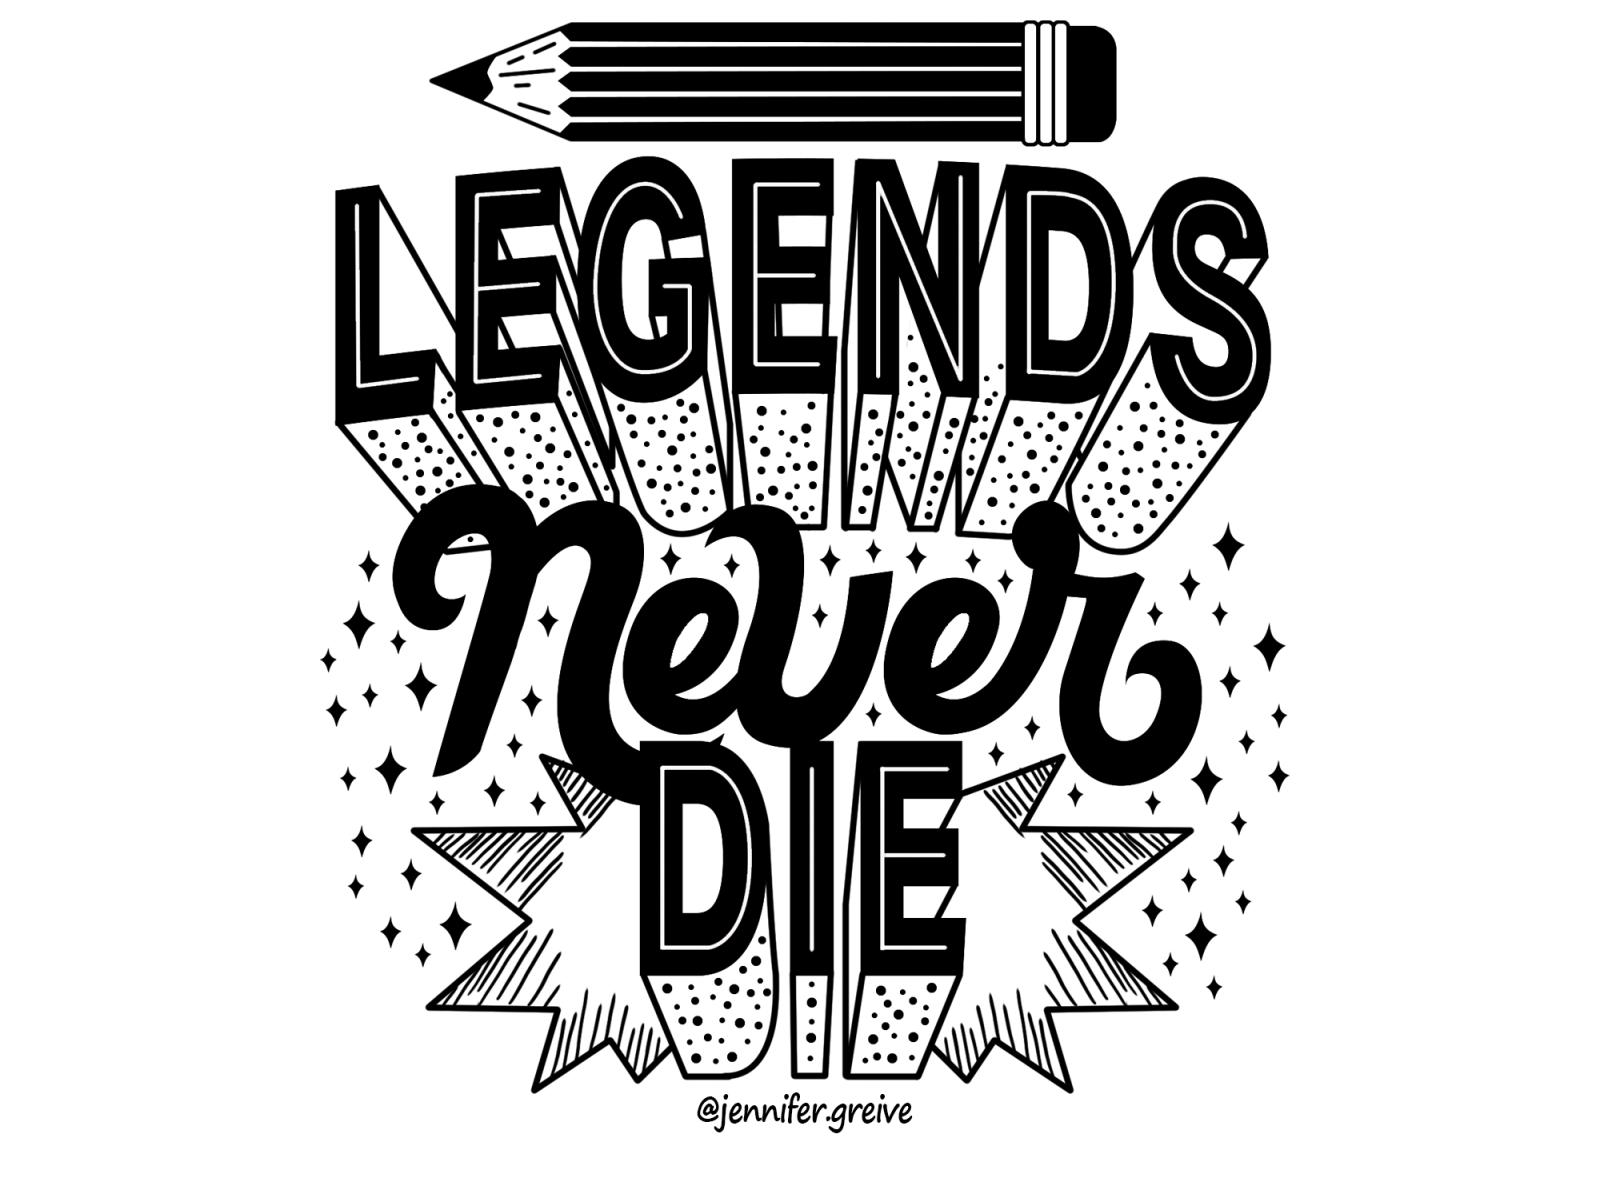 Legends Never Die Wallpapers Wallpaper Cave